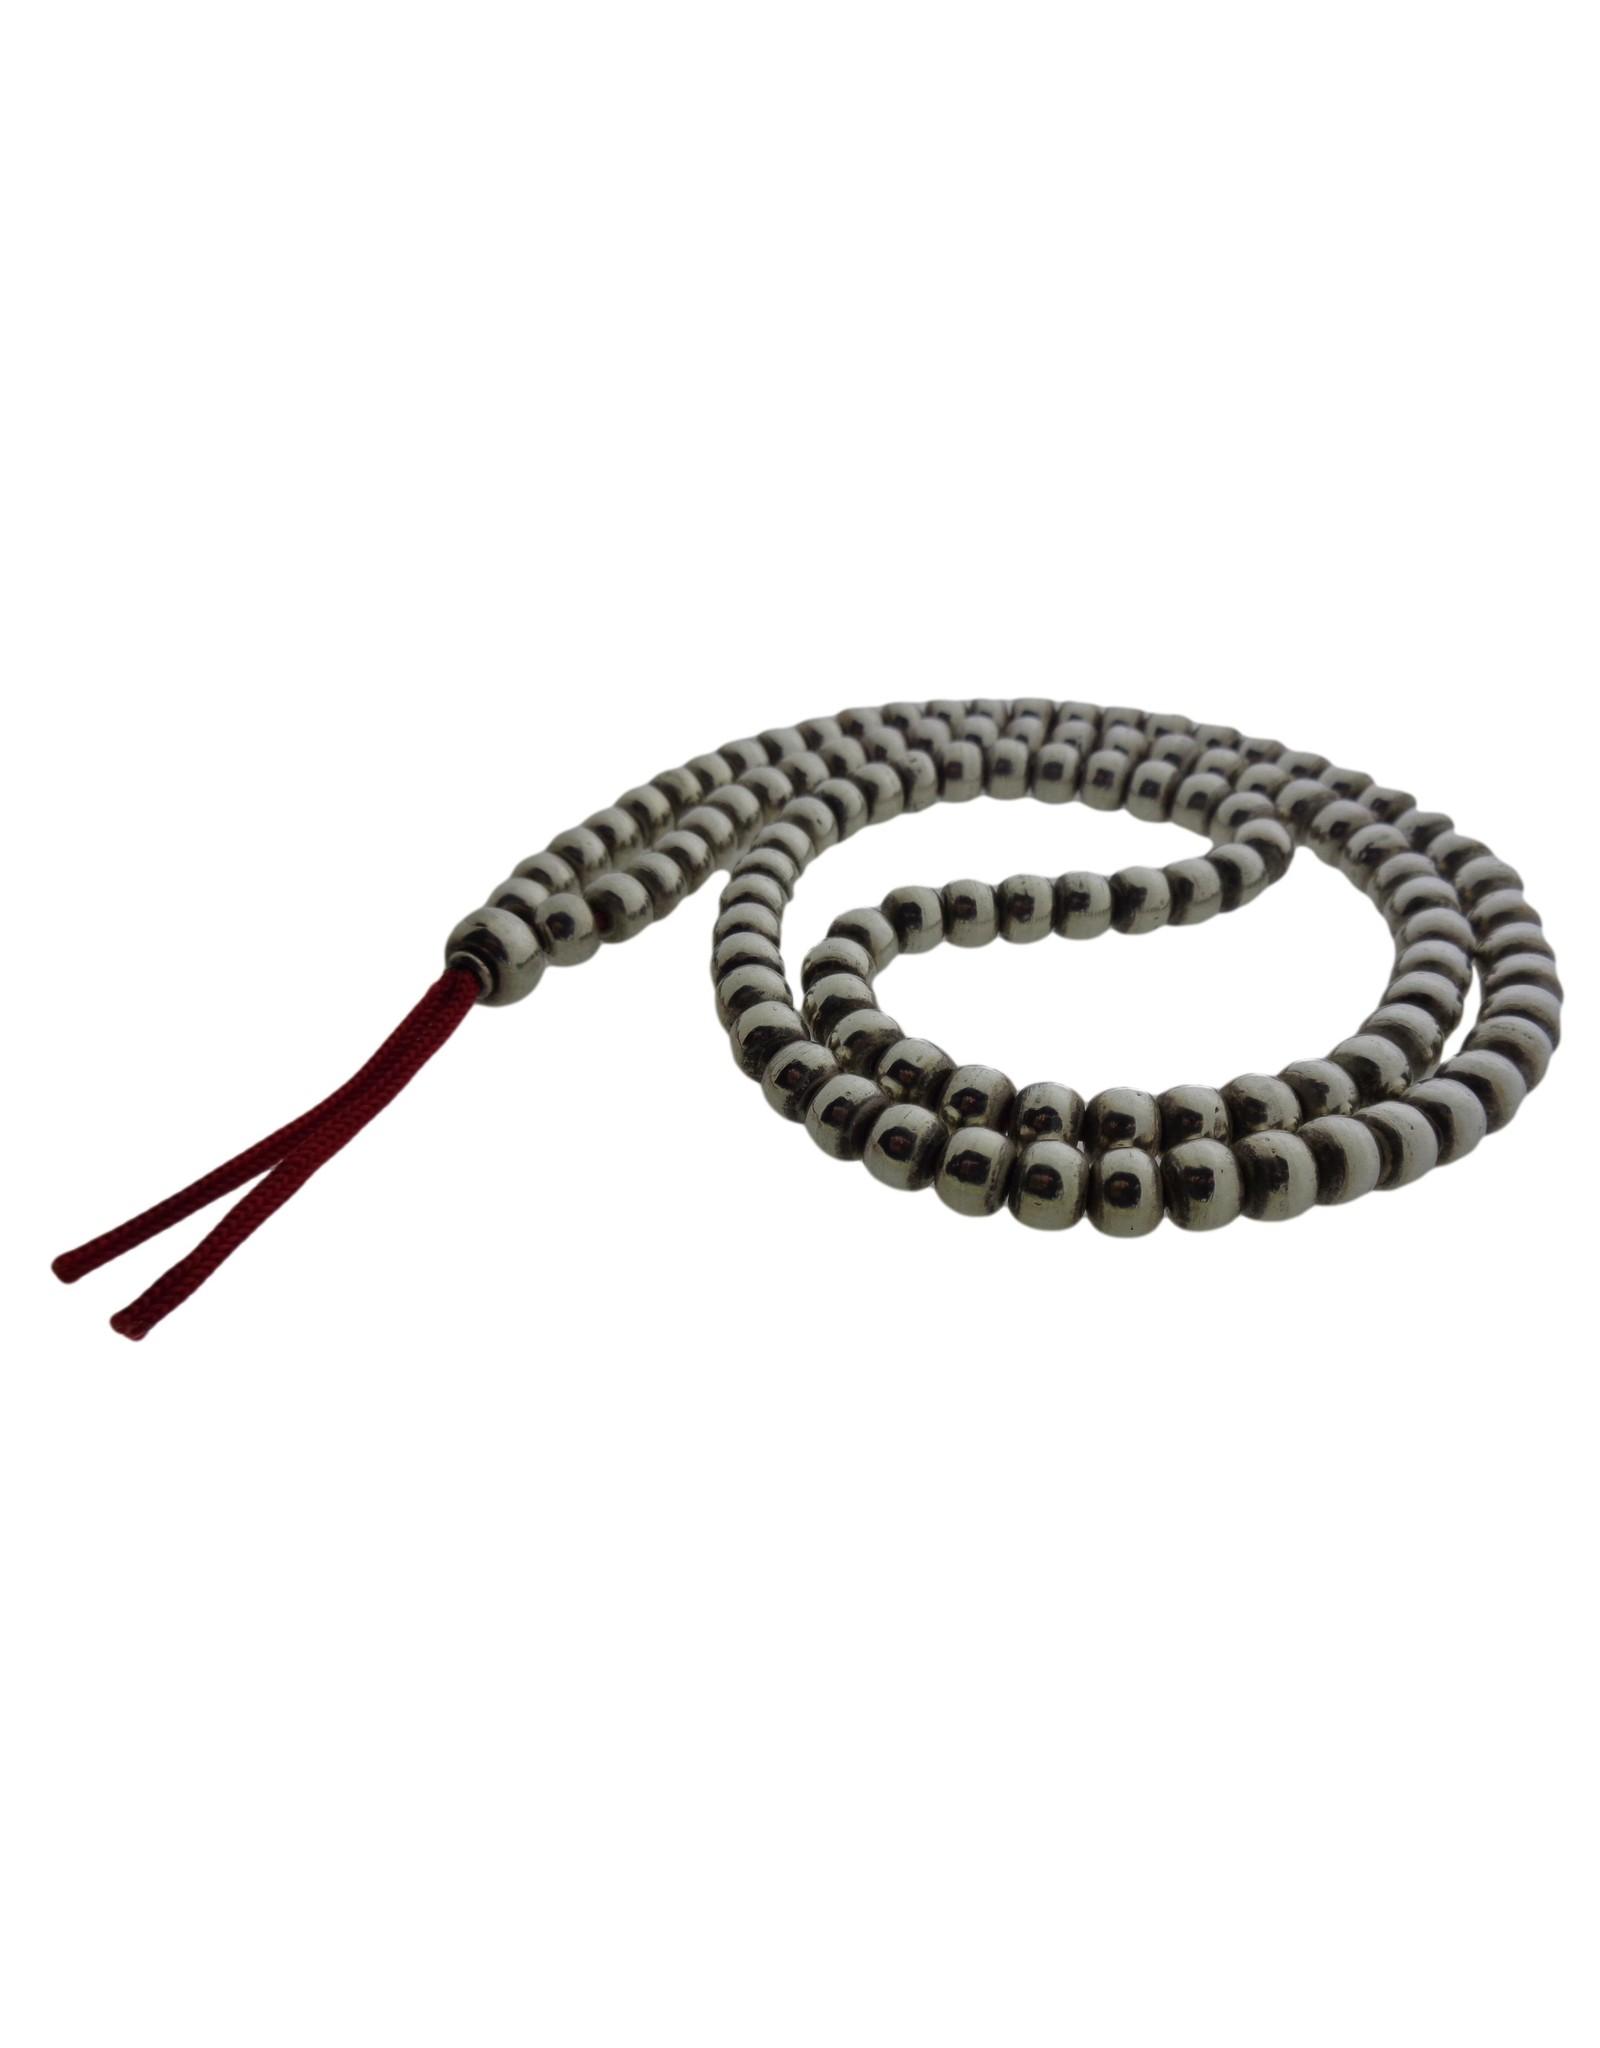 Dakini mala with handmade silver beads